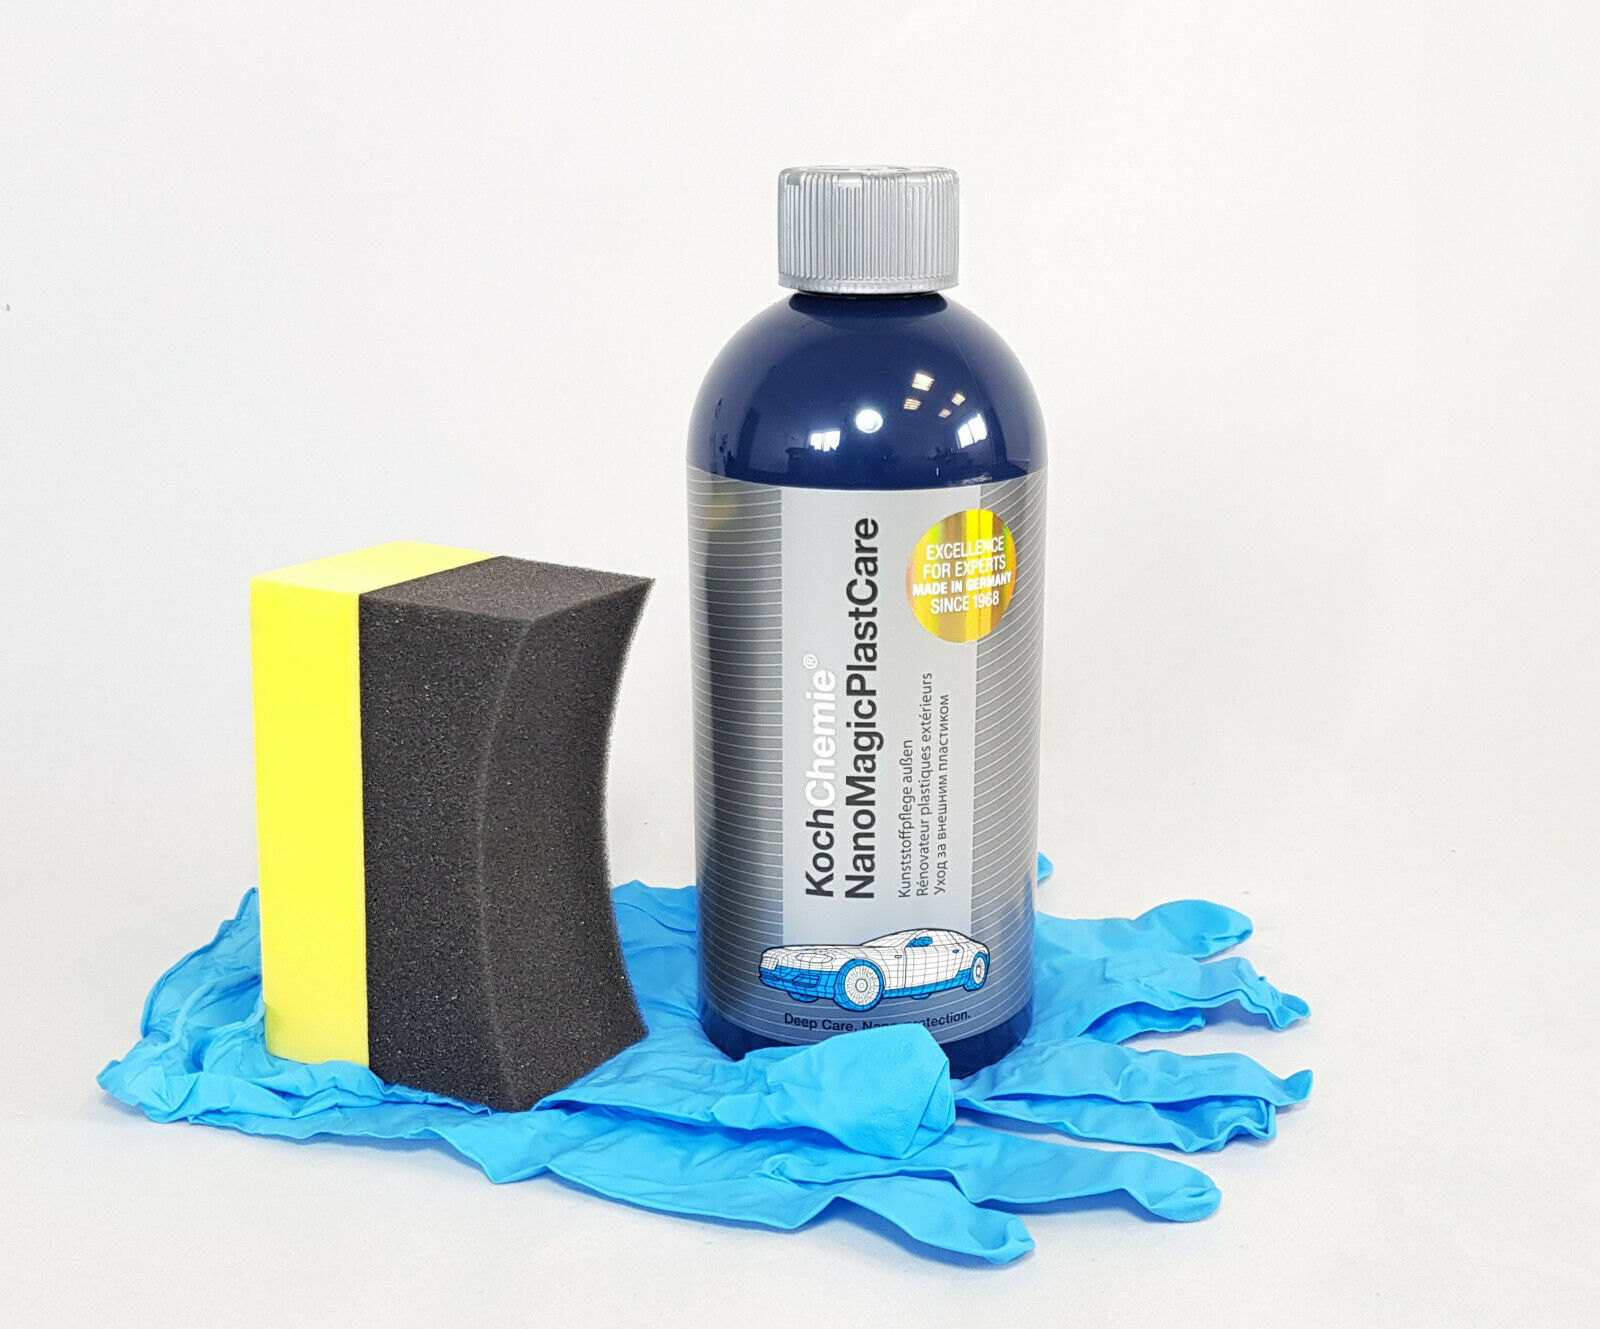 Koch Chemie Nano Magic Plast Care Kunststoffpflege Schwamm, Nitril-Handschuhe